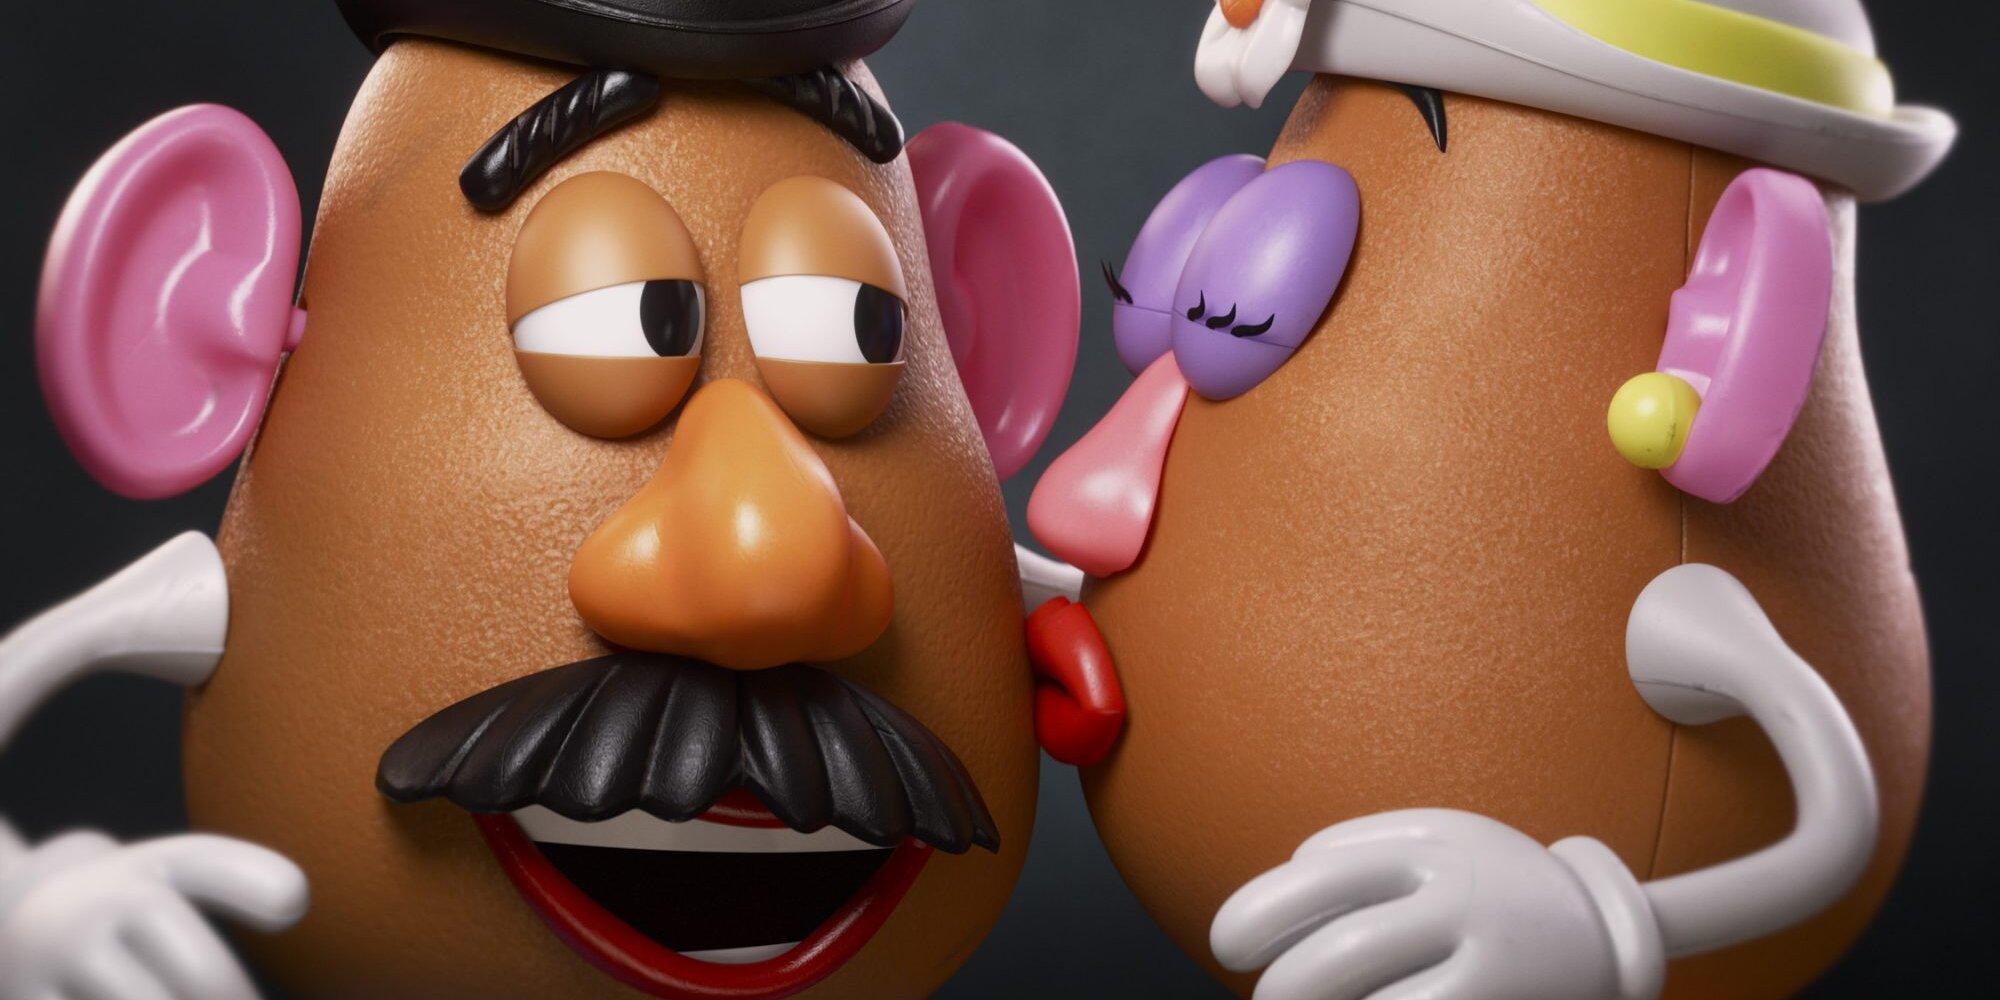 Hasbro rebrands Potato Head toys with gender-neutral name